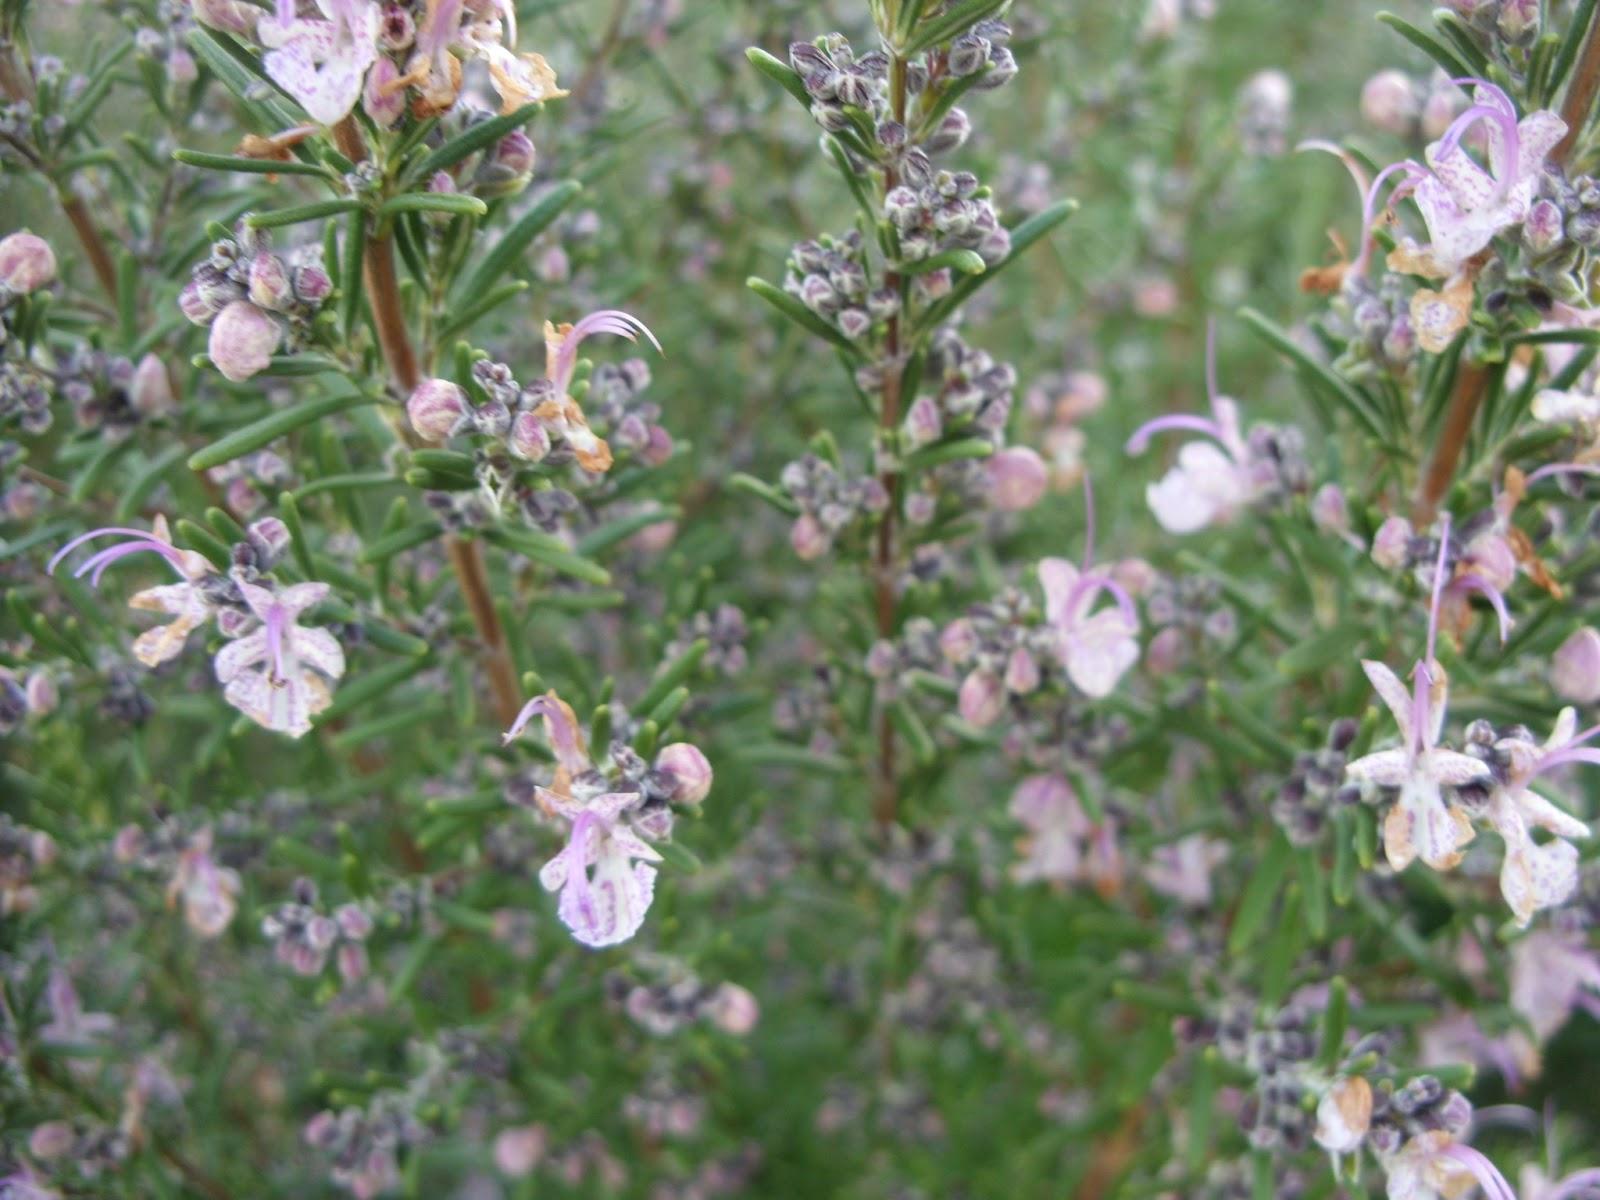 flores do meu jardim letra:Jardim Autóctone: Alecrim (Rosmarinus officinalis)